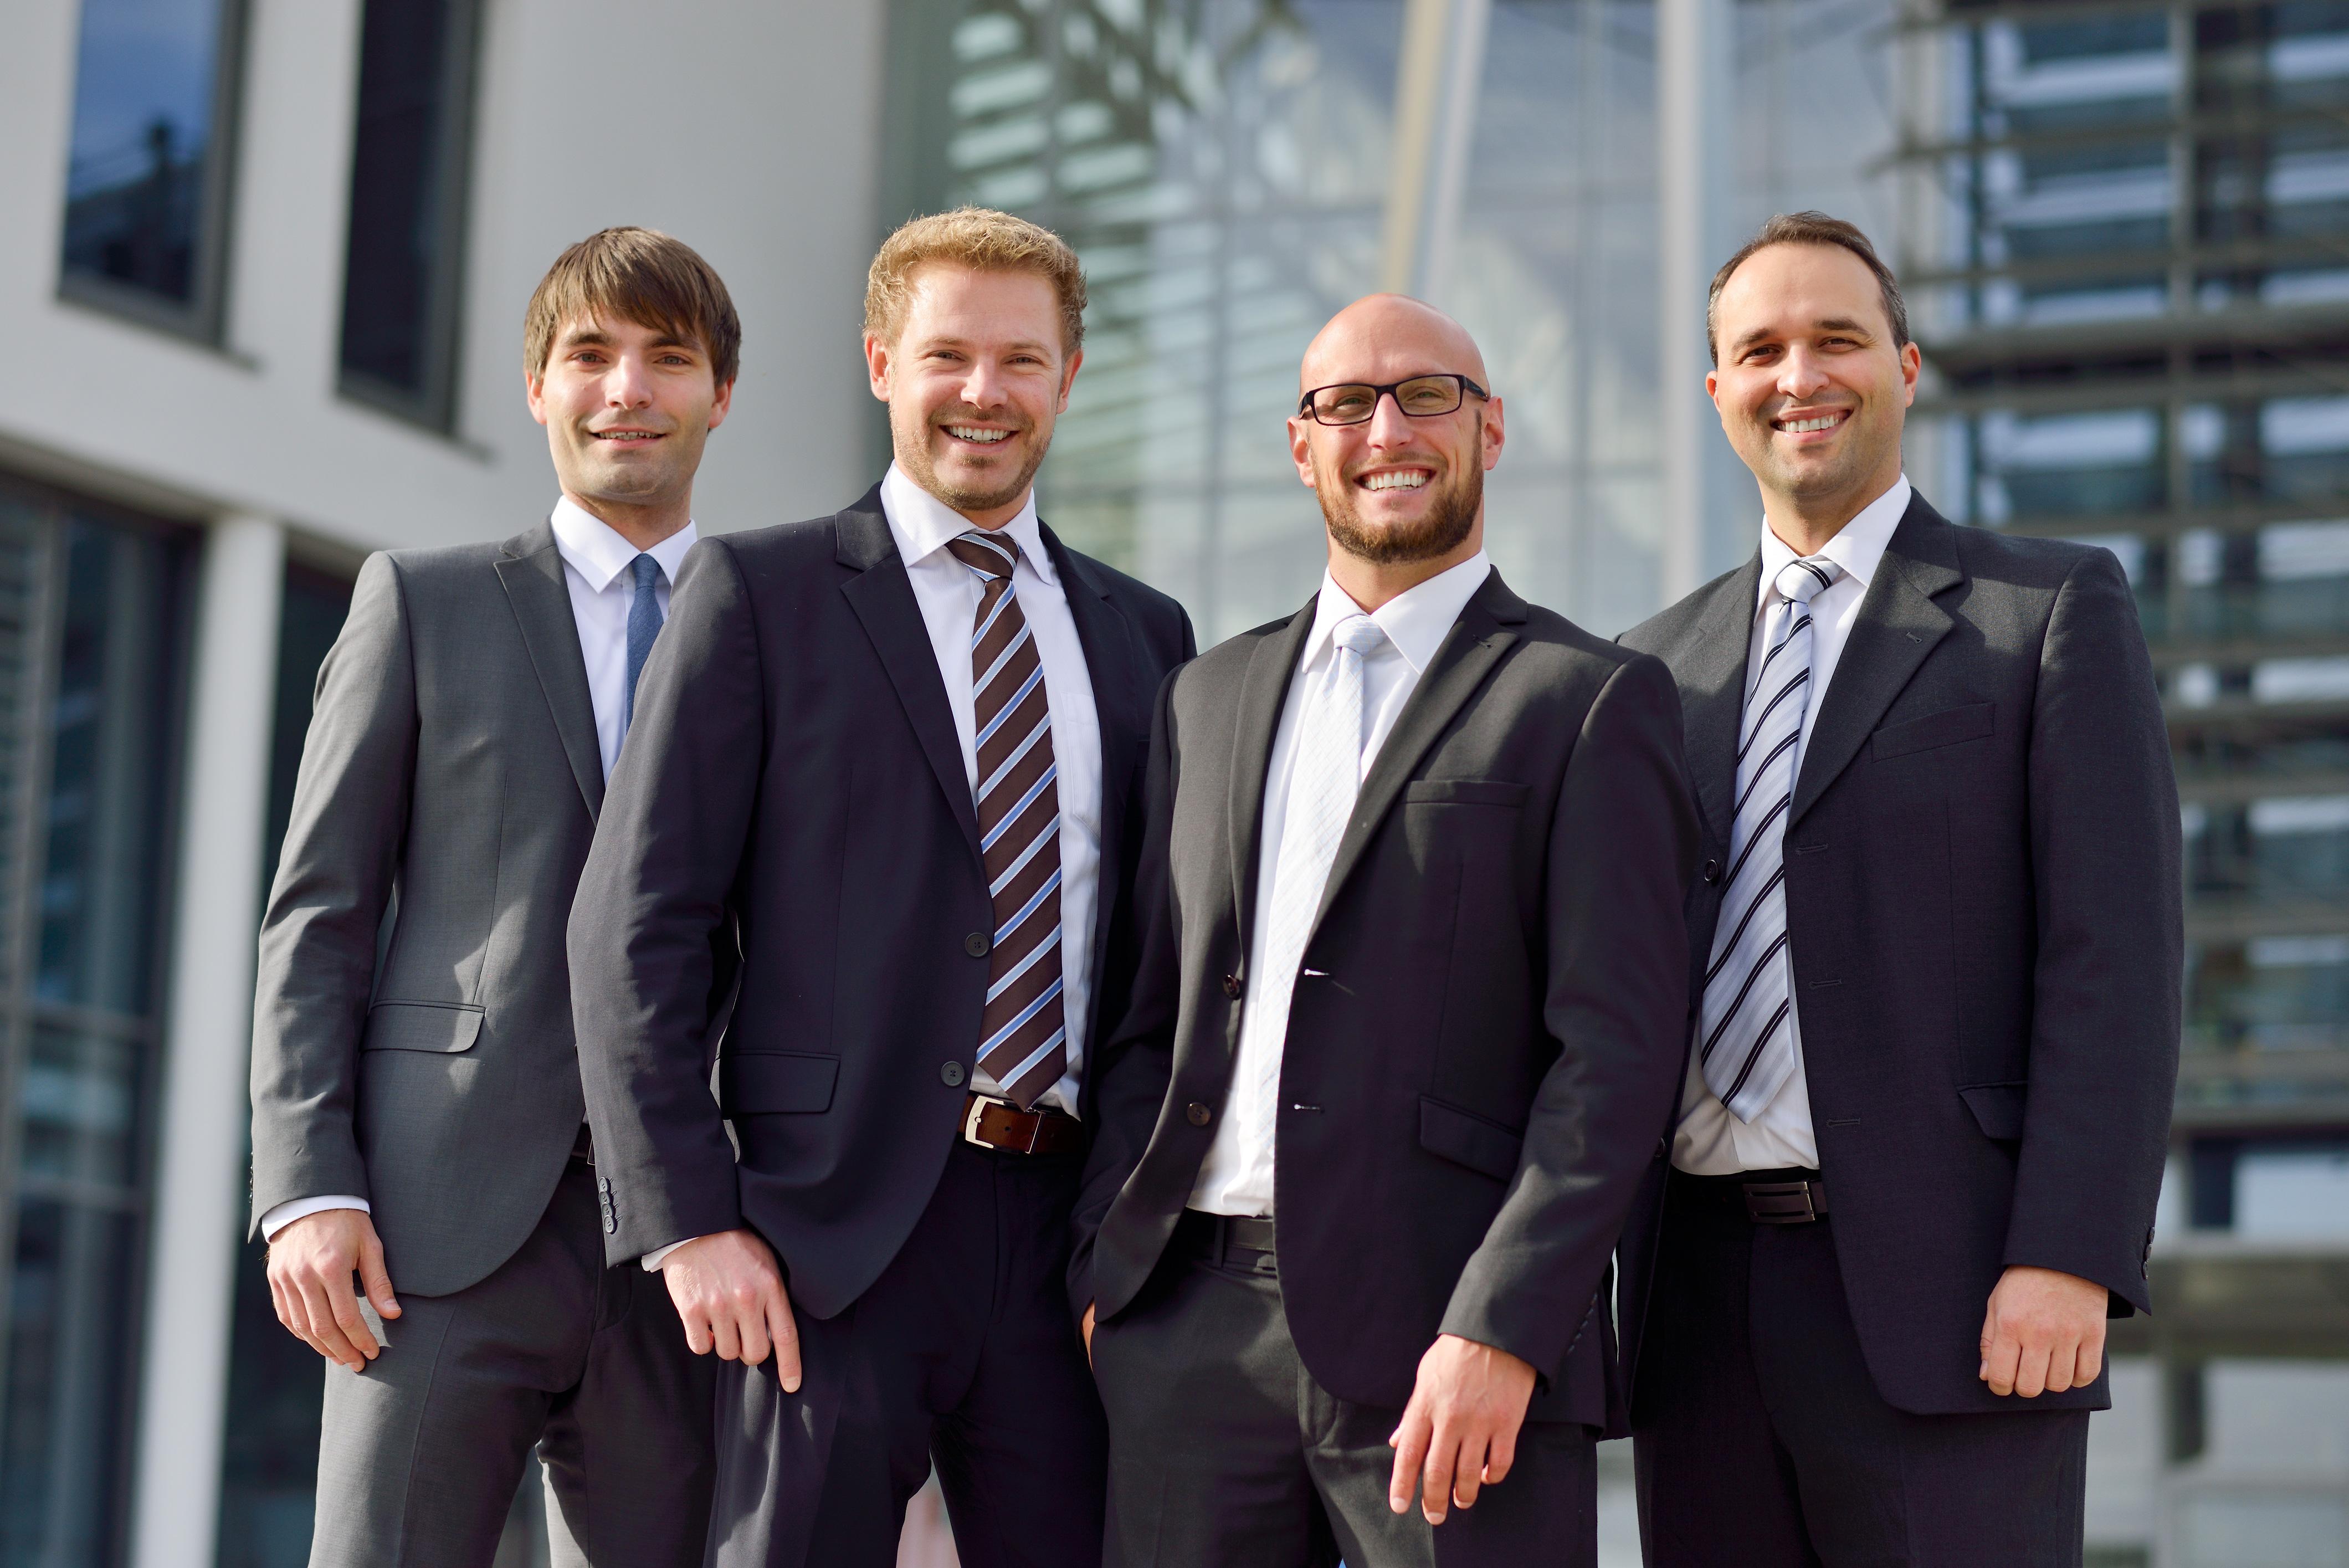 The founding team of Cevotec